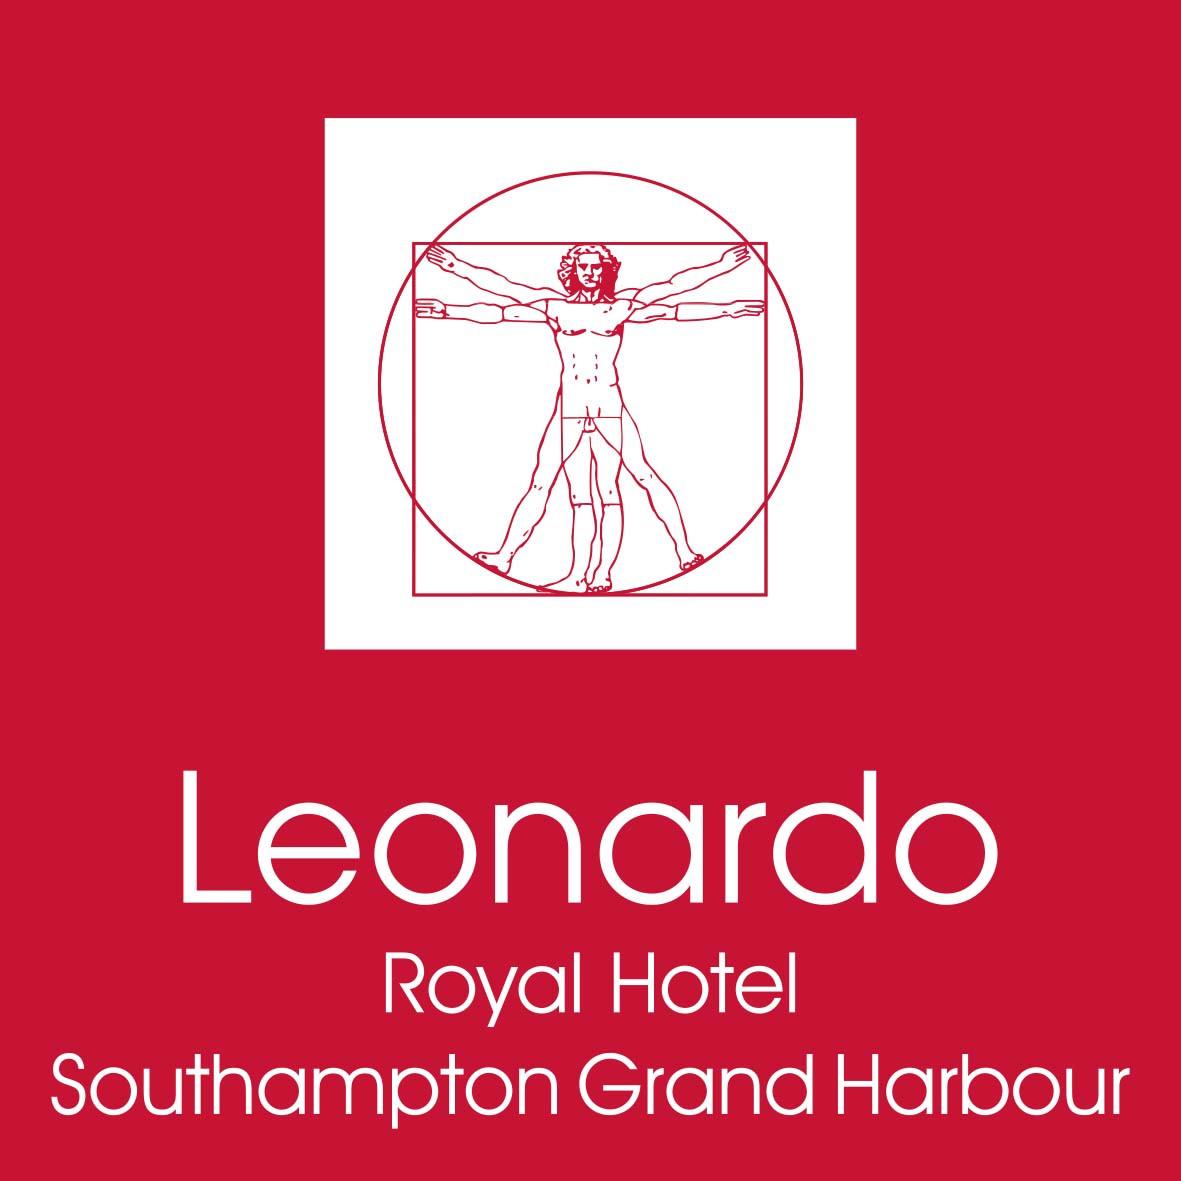 Leonardo Royal Hotel Southampton Grand Harbour